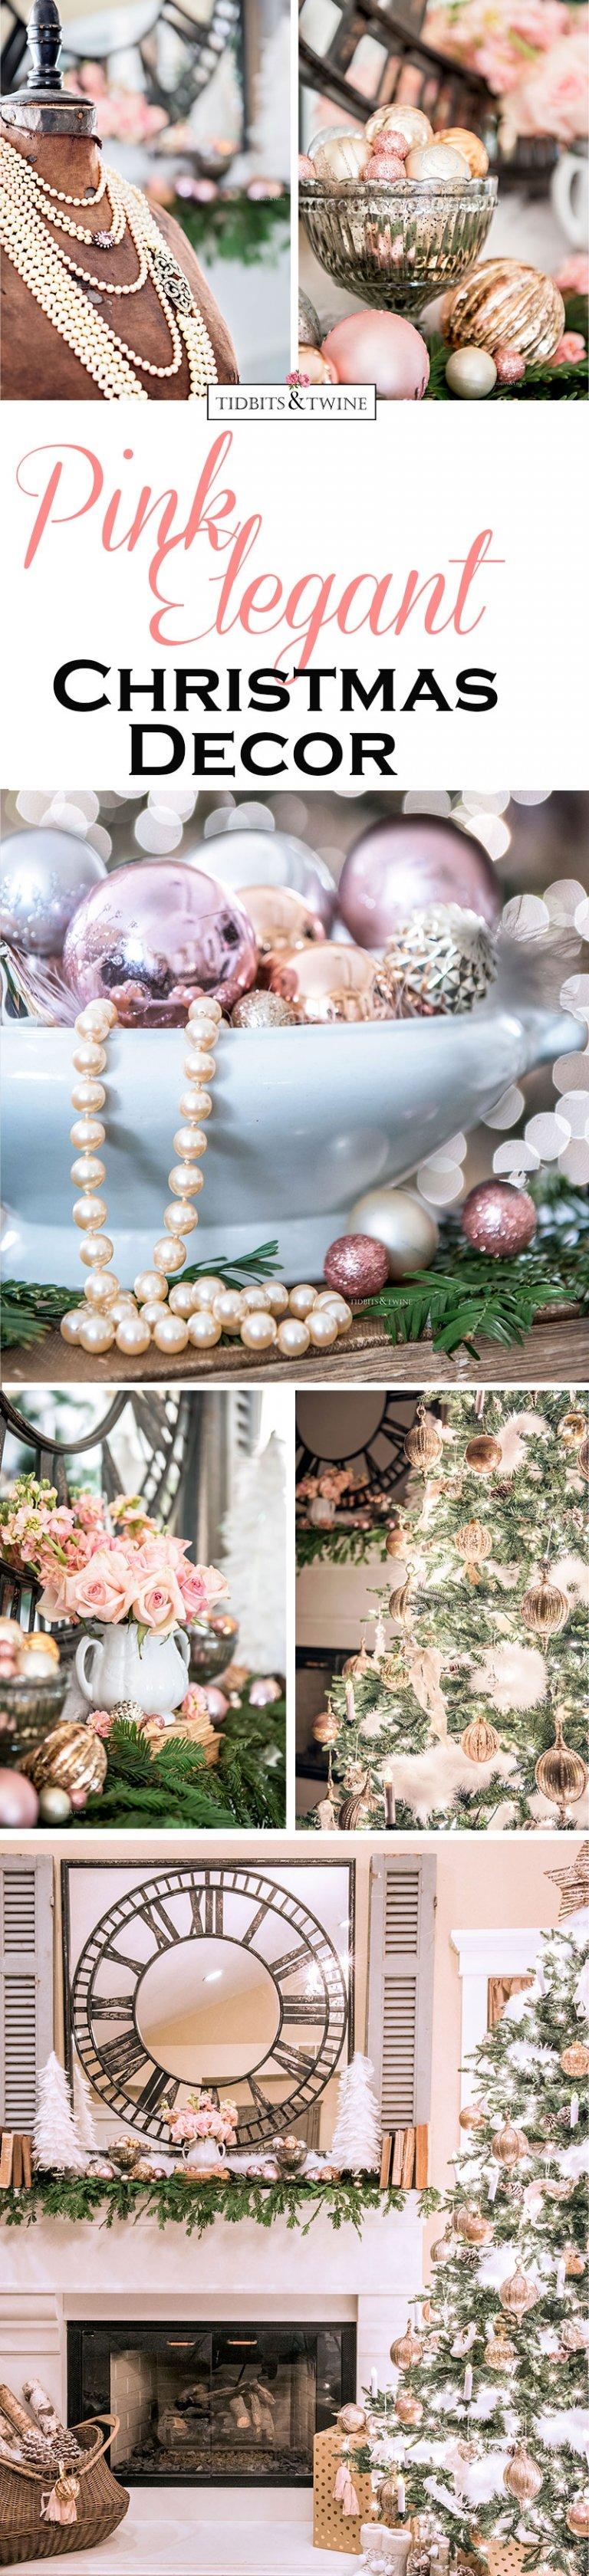 Tidbits&Twine – A Peaceful Pink Christmas Bedroom